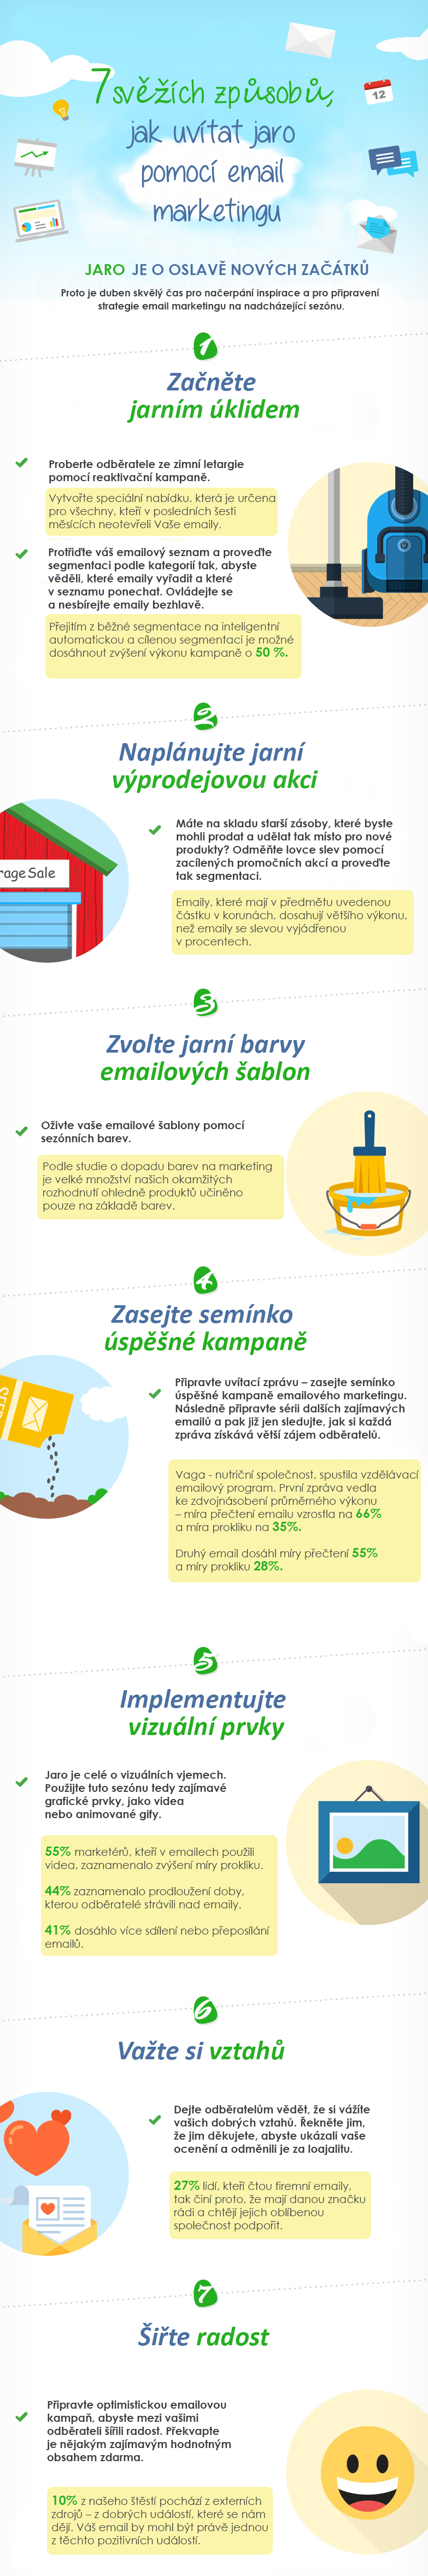 infografika_7_svezich_zpusobu_jak_uvitat_jaro_pomoci_emailoveho_marketingu